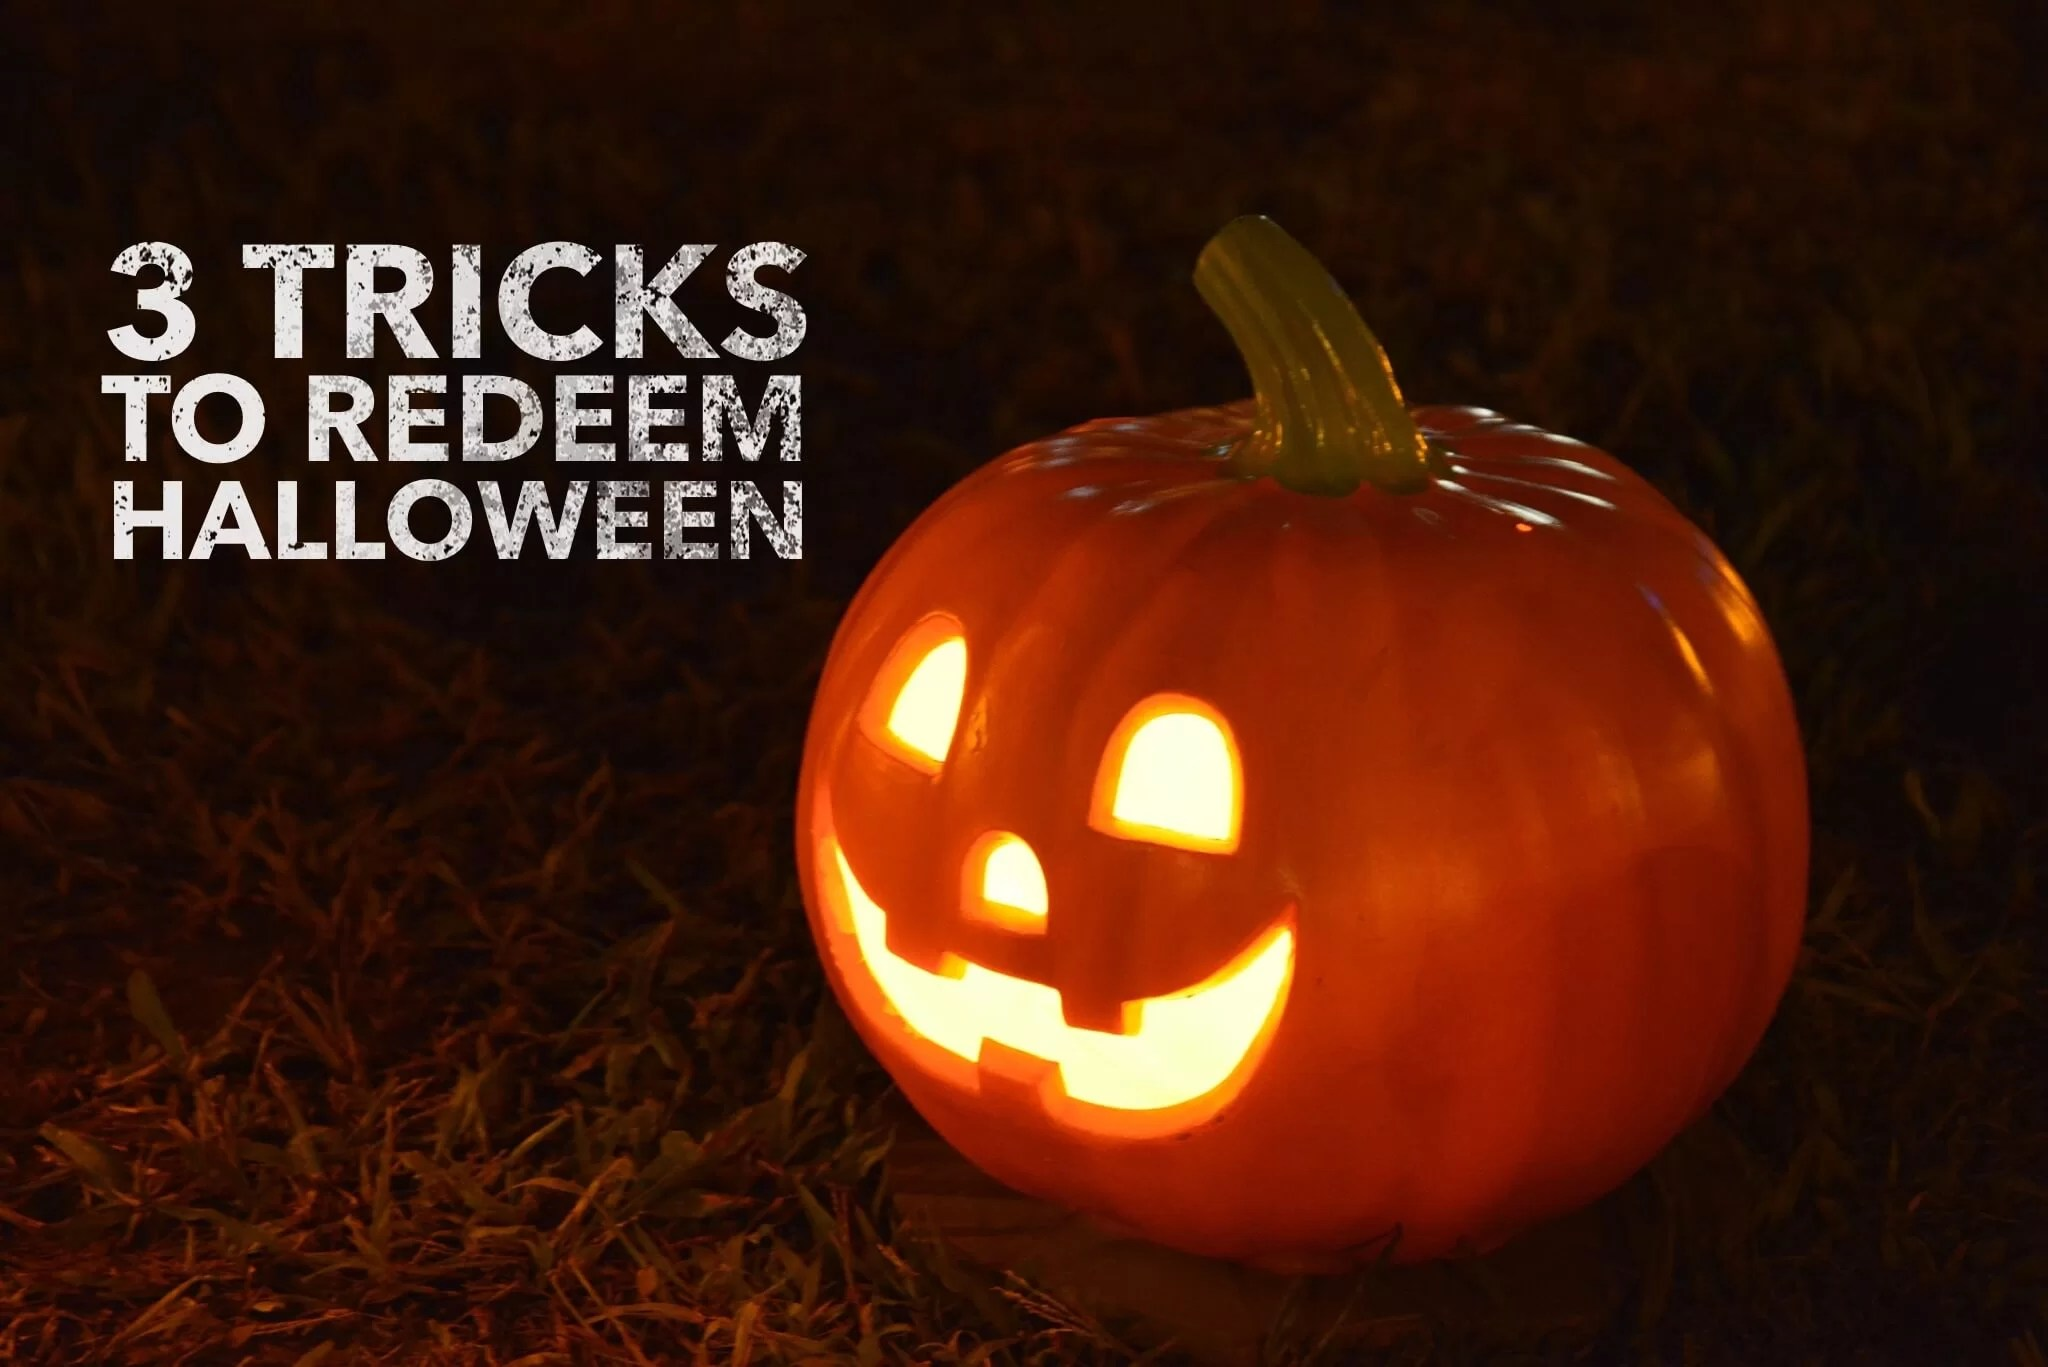 Tricks to Redeem Halloween